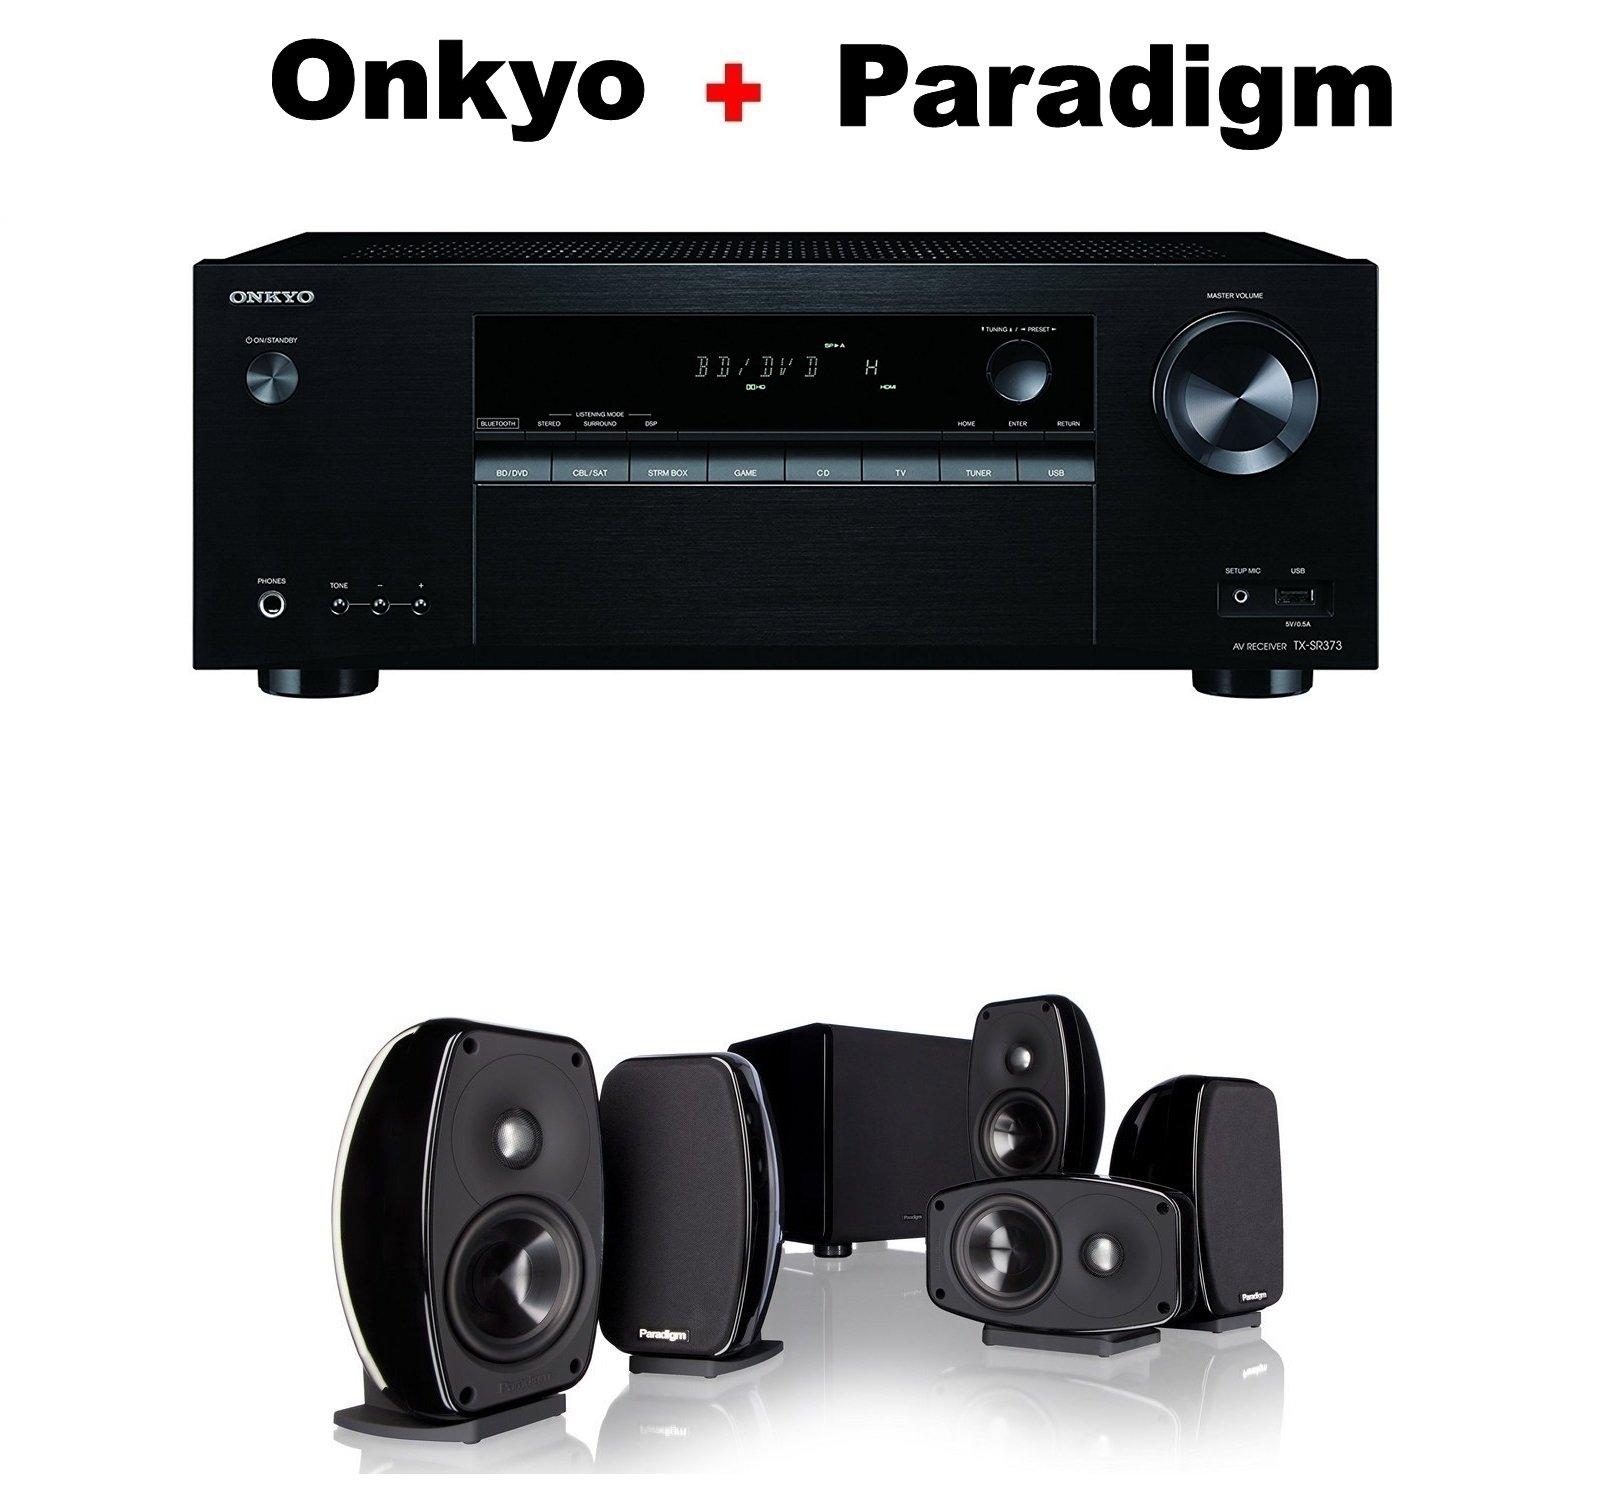 Onkyo Authentic Audio & Video Component Receiver Black (TX-SR373) + Paradigm Cinema 100 CT 5.1 Home Theater System Bundle